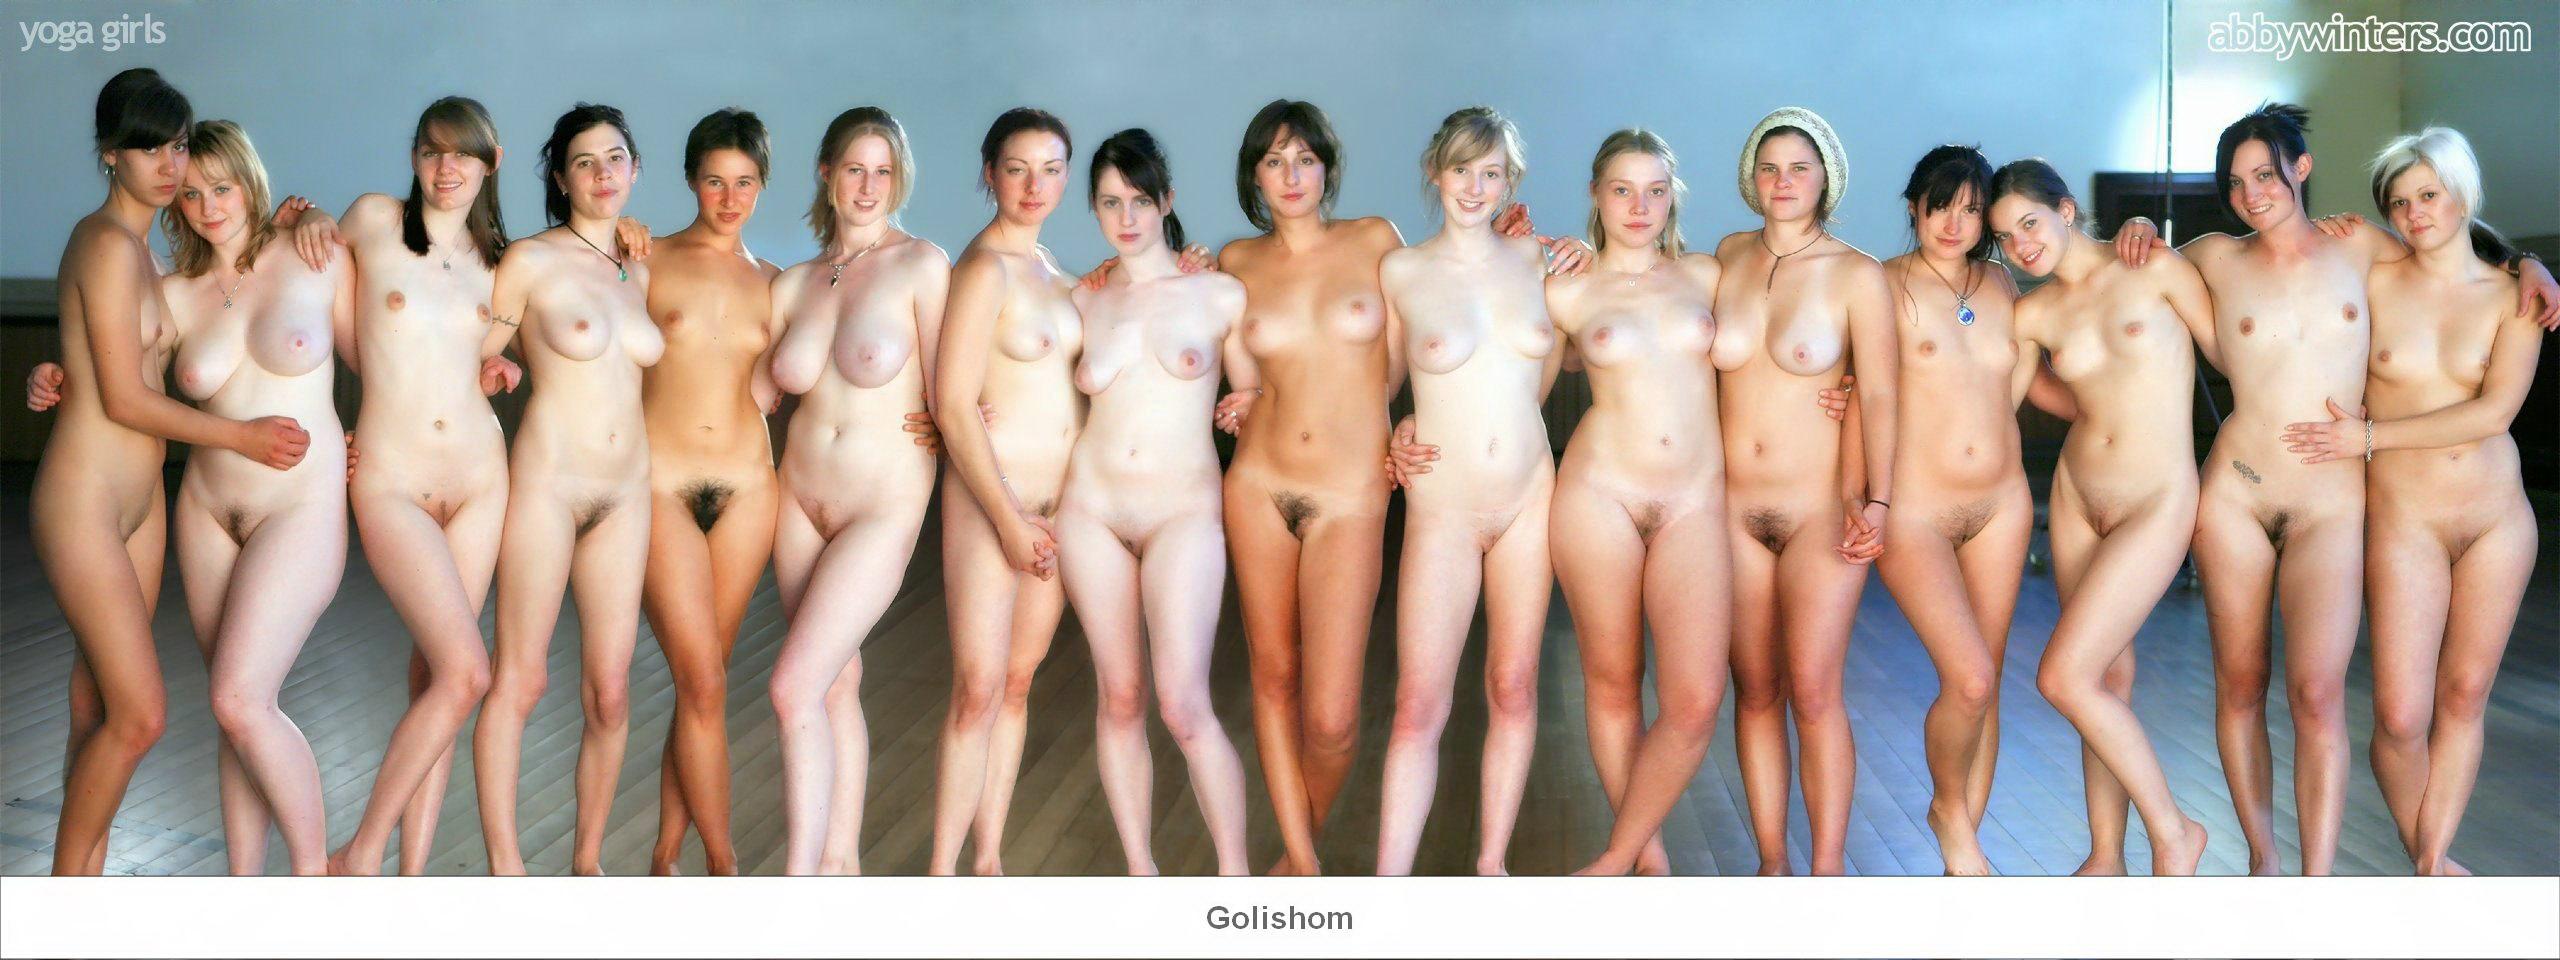 german-girls-nacked-nude-amature-sex-videos-interracial